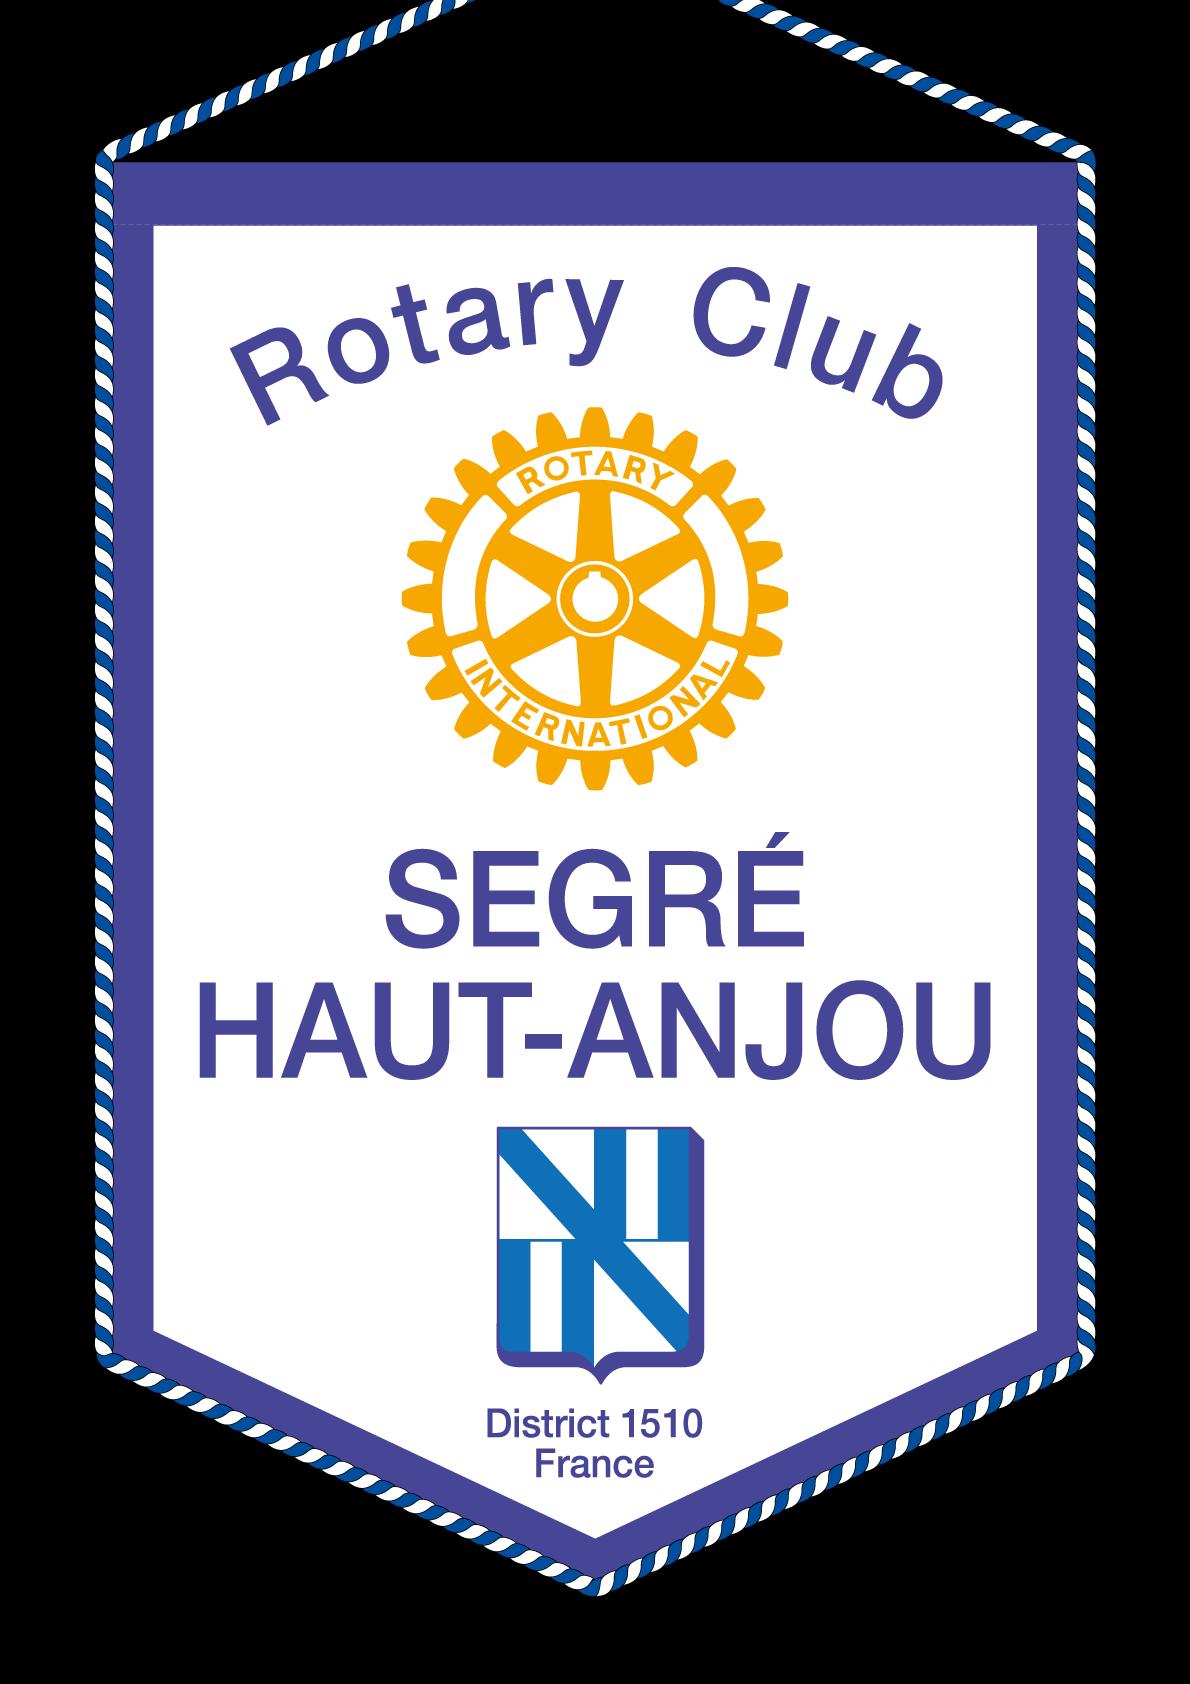 FANION ROTARY CLUB SEGRE HAUT ANJOU